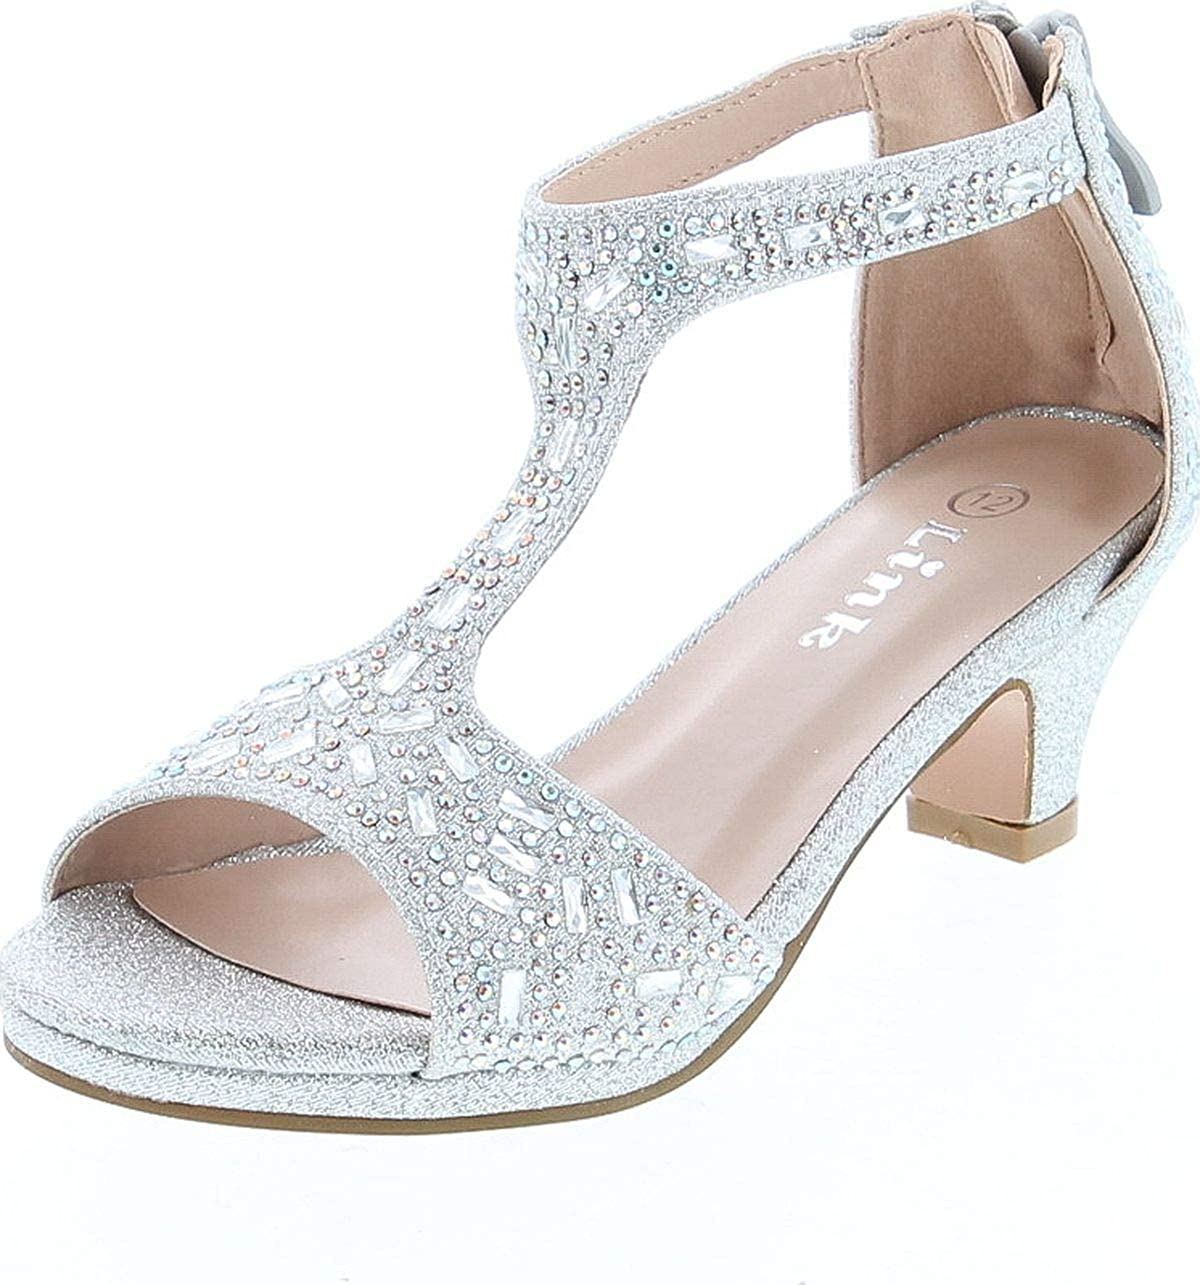 Link Excited-95K Girl's Glitter Rhinestone T-Strap Back Zipper Wrapped Heel Sandals